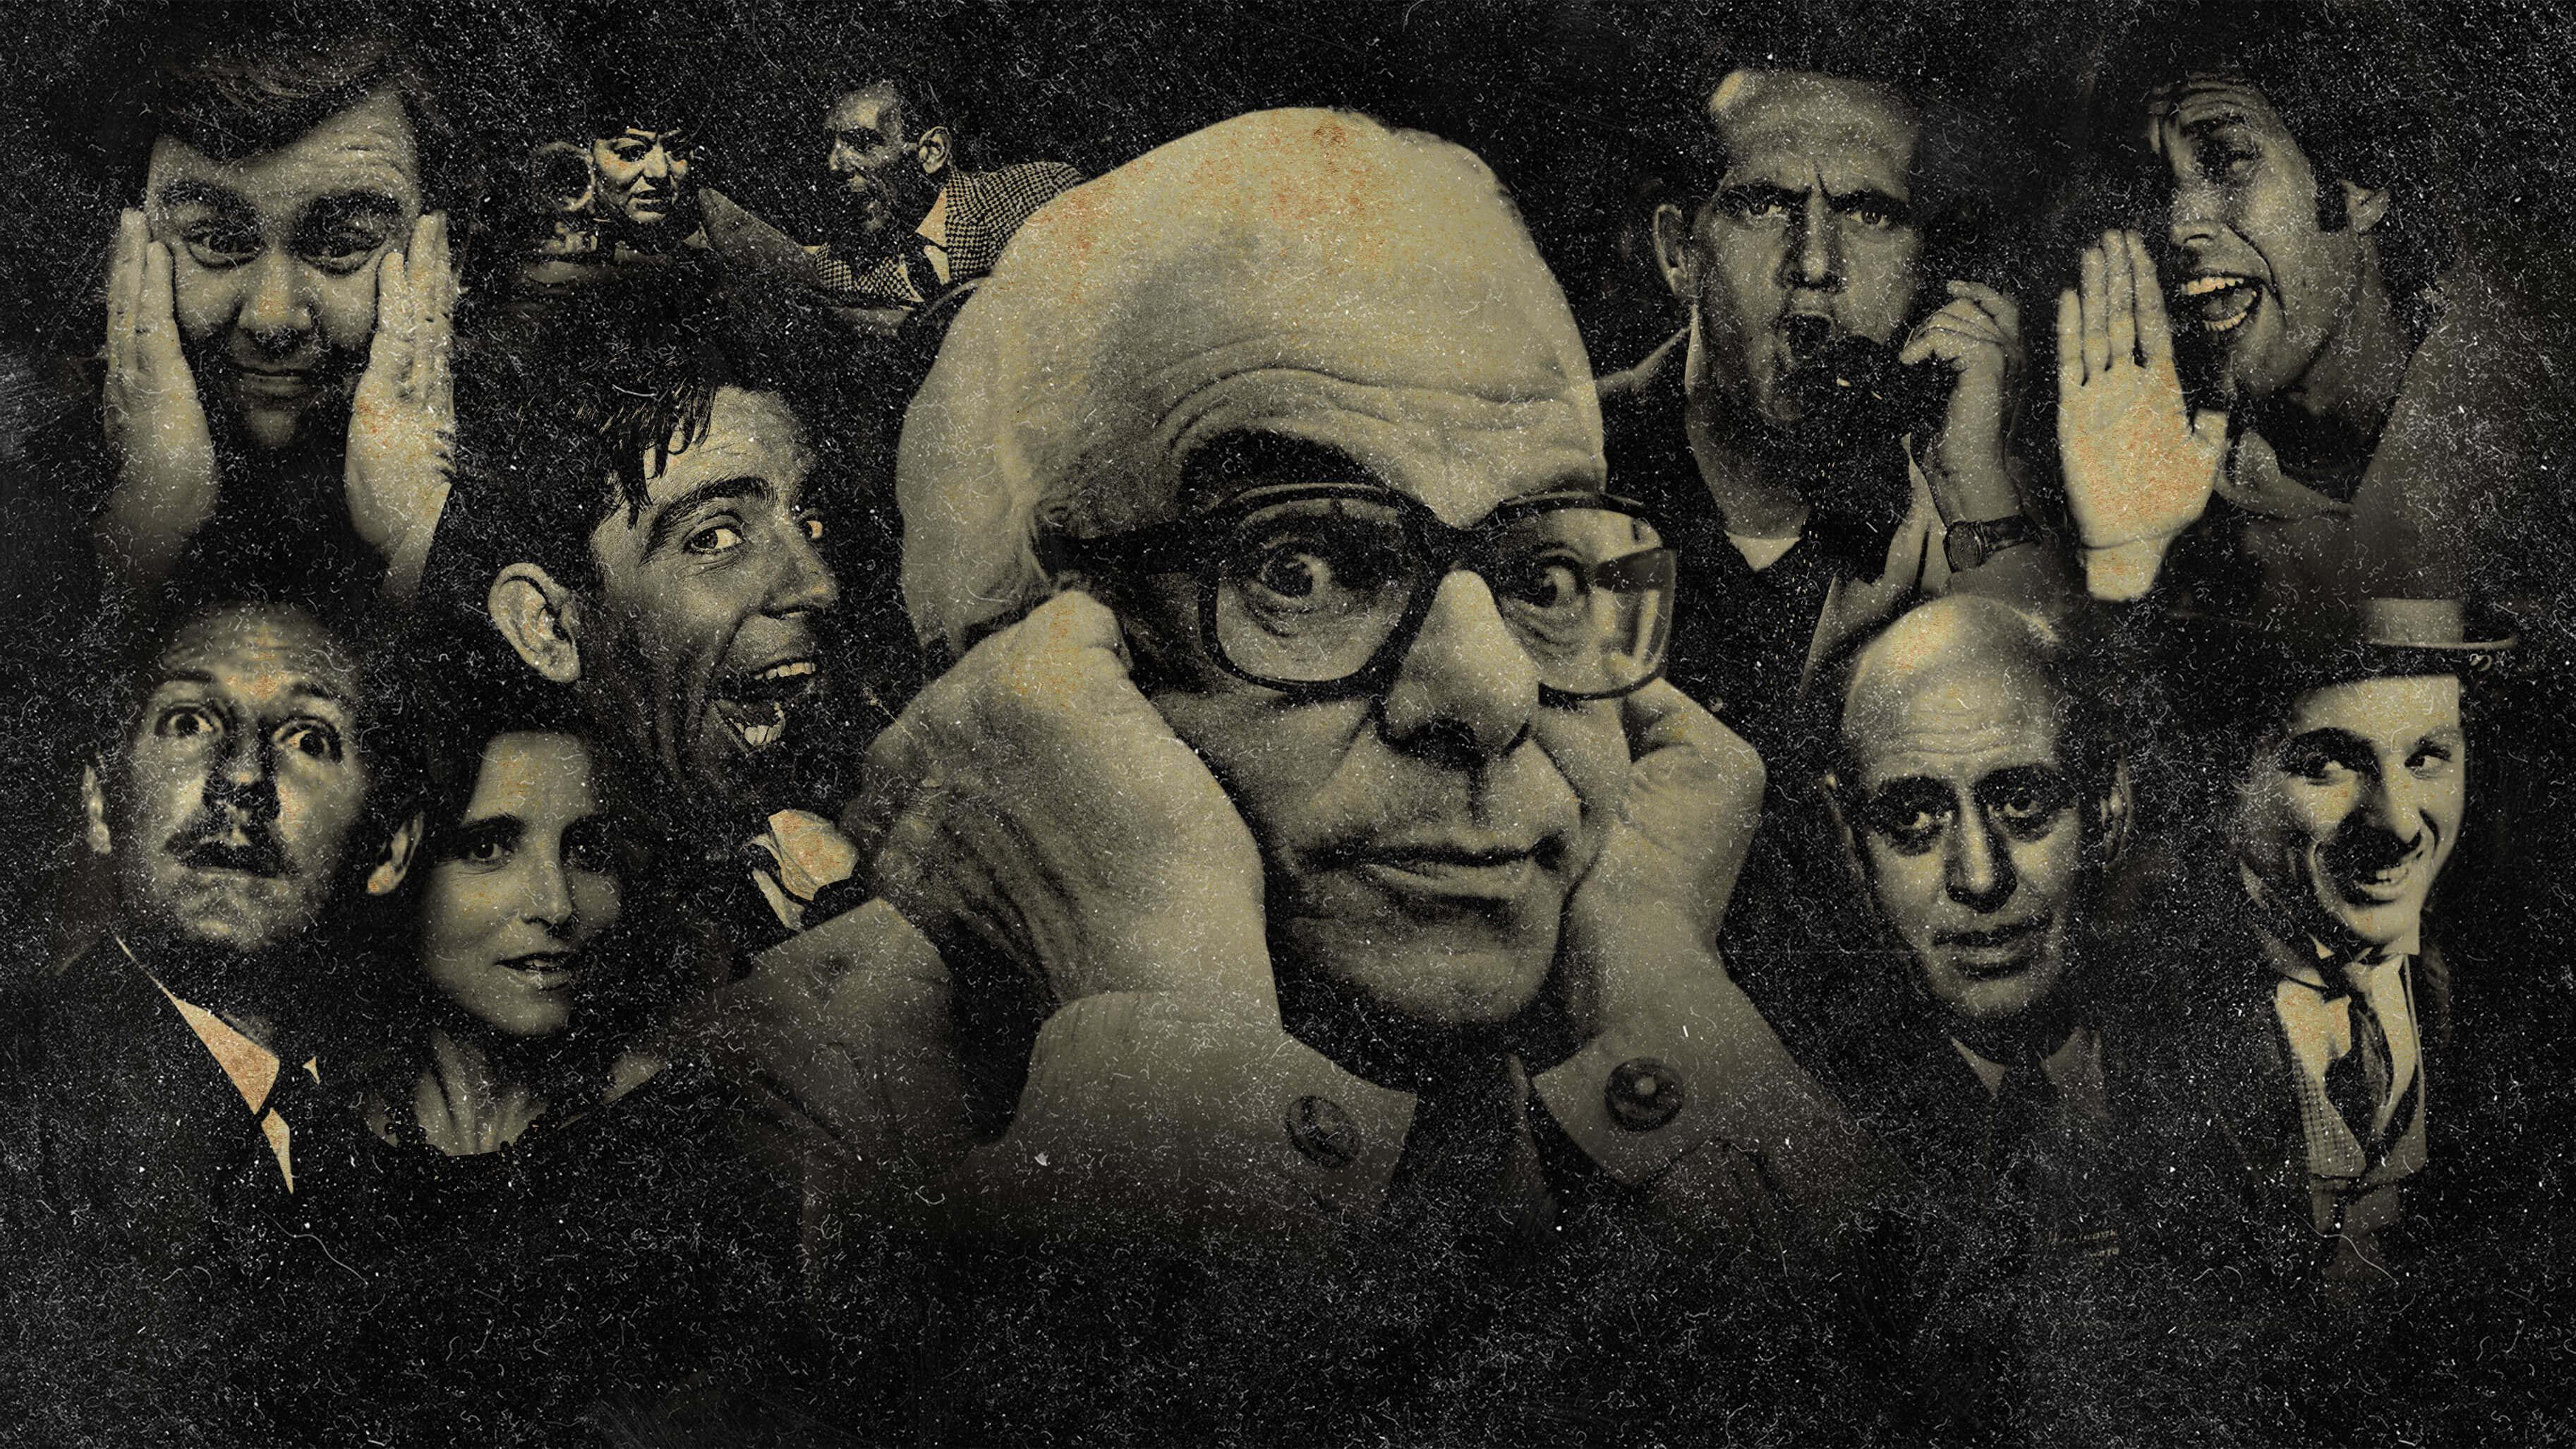 photo montage of famous comedians